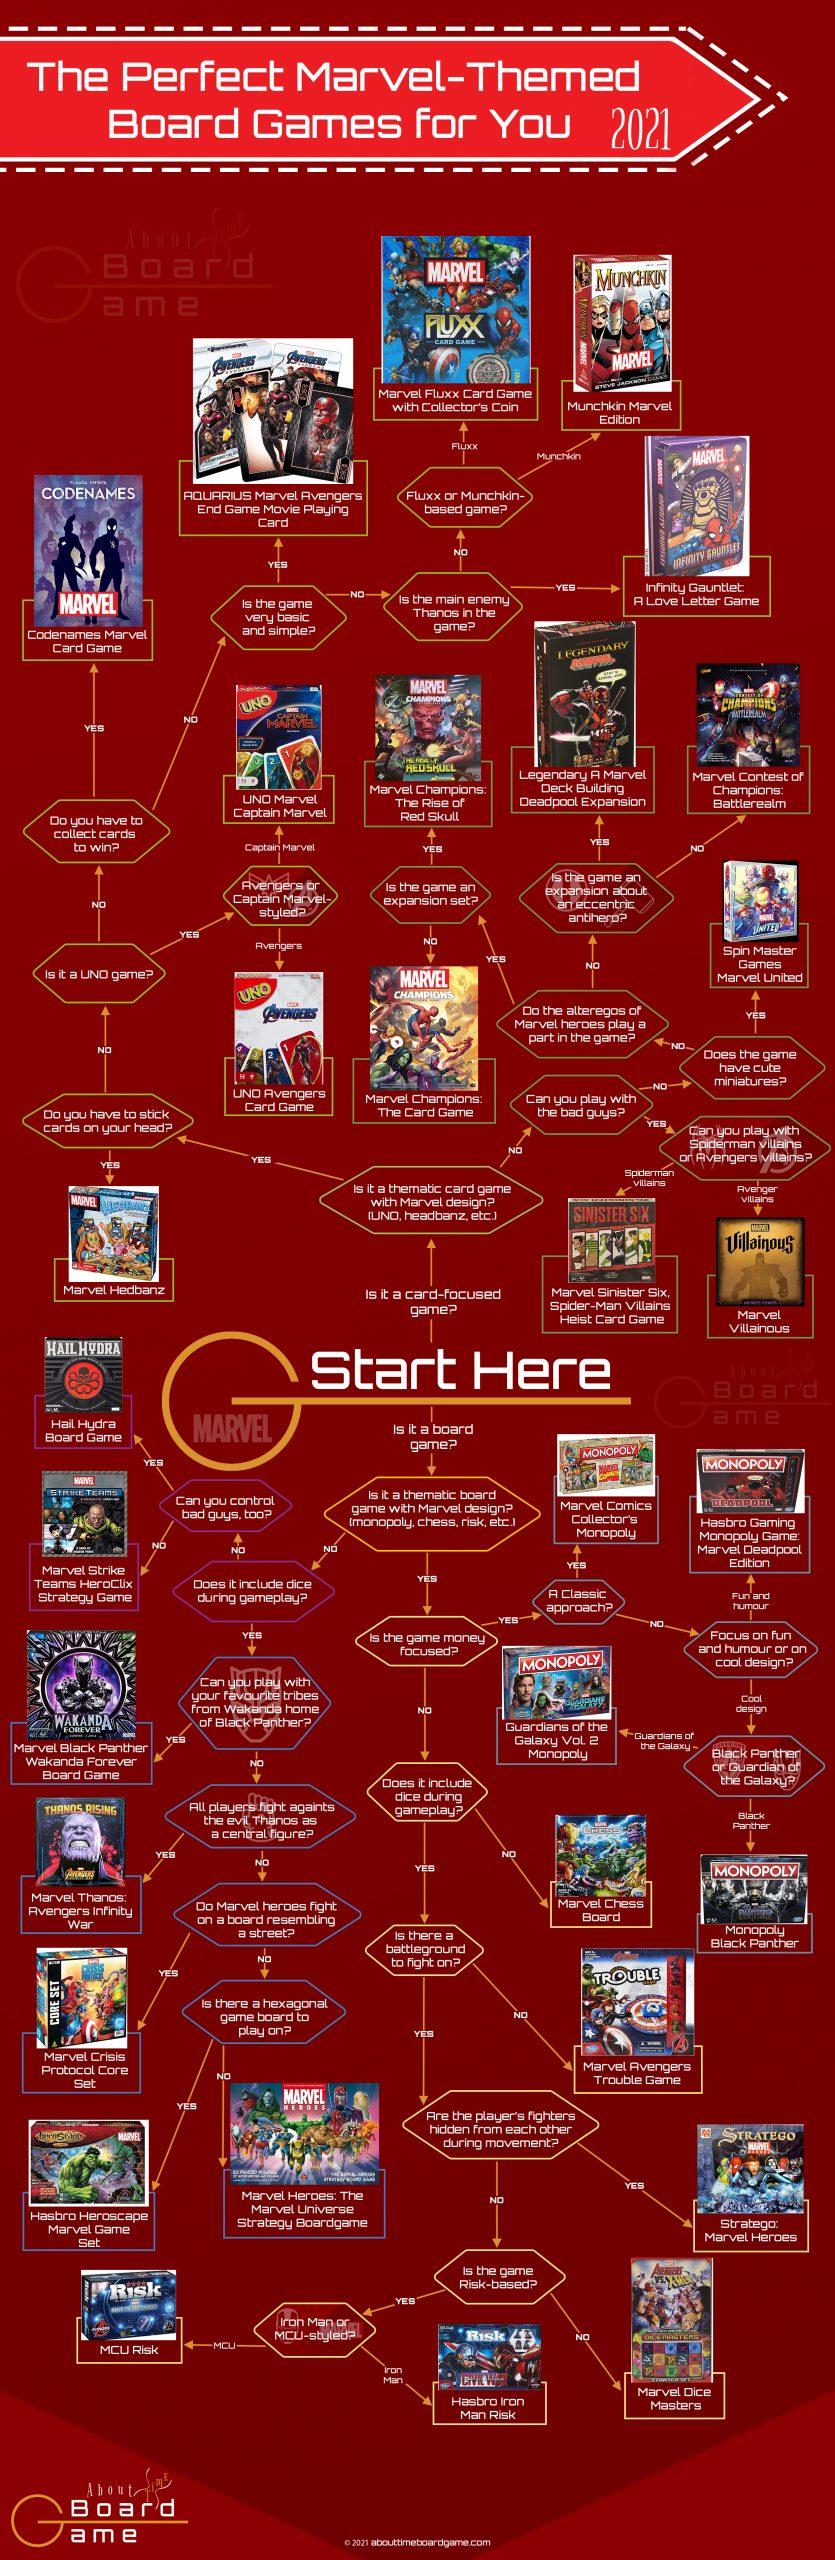 Choose the Best Marvel Game